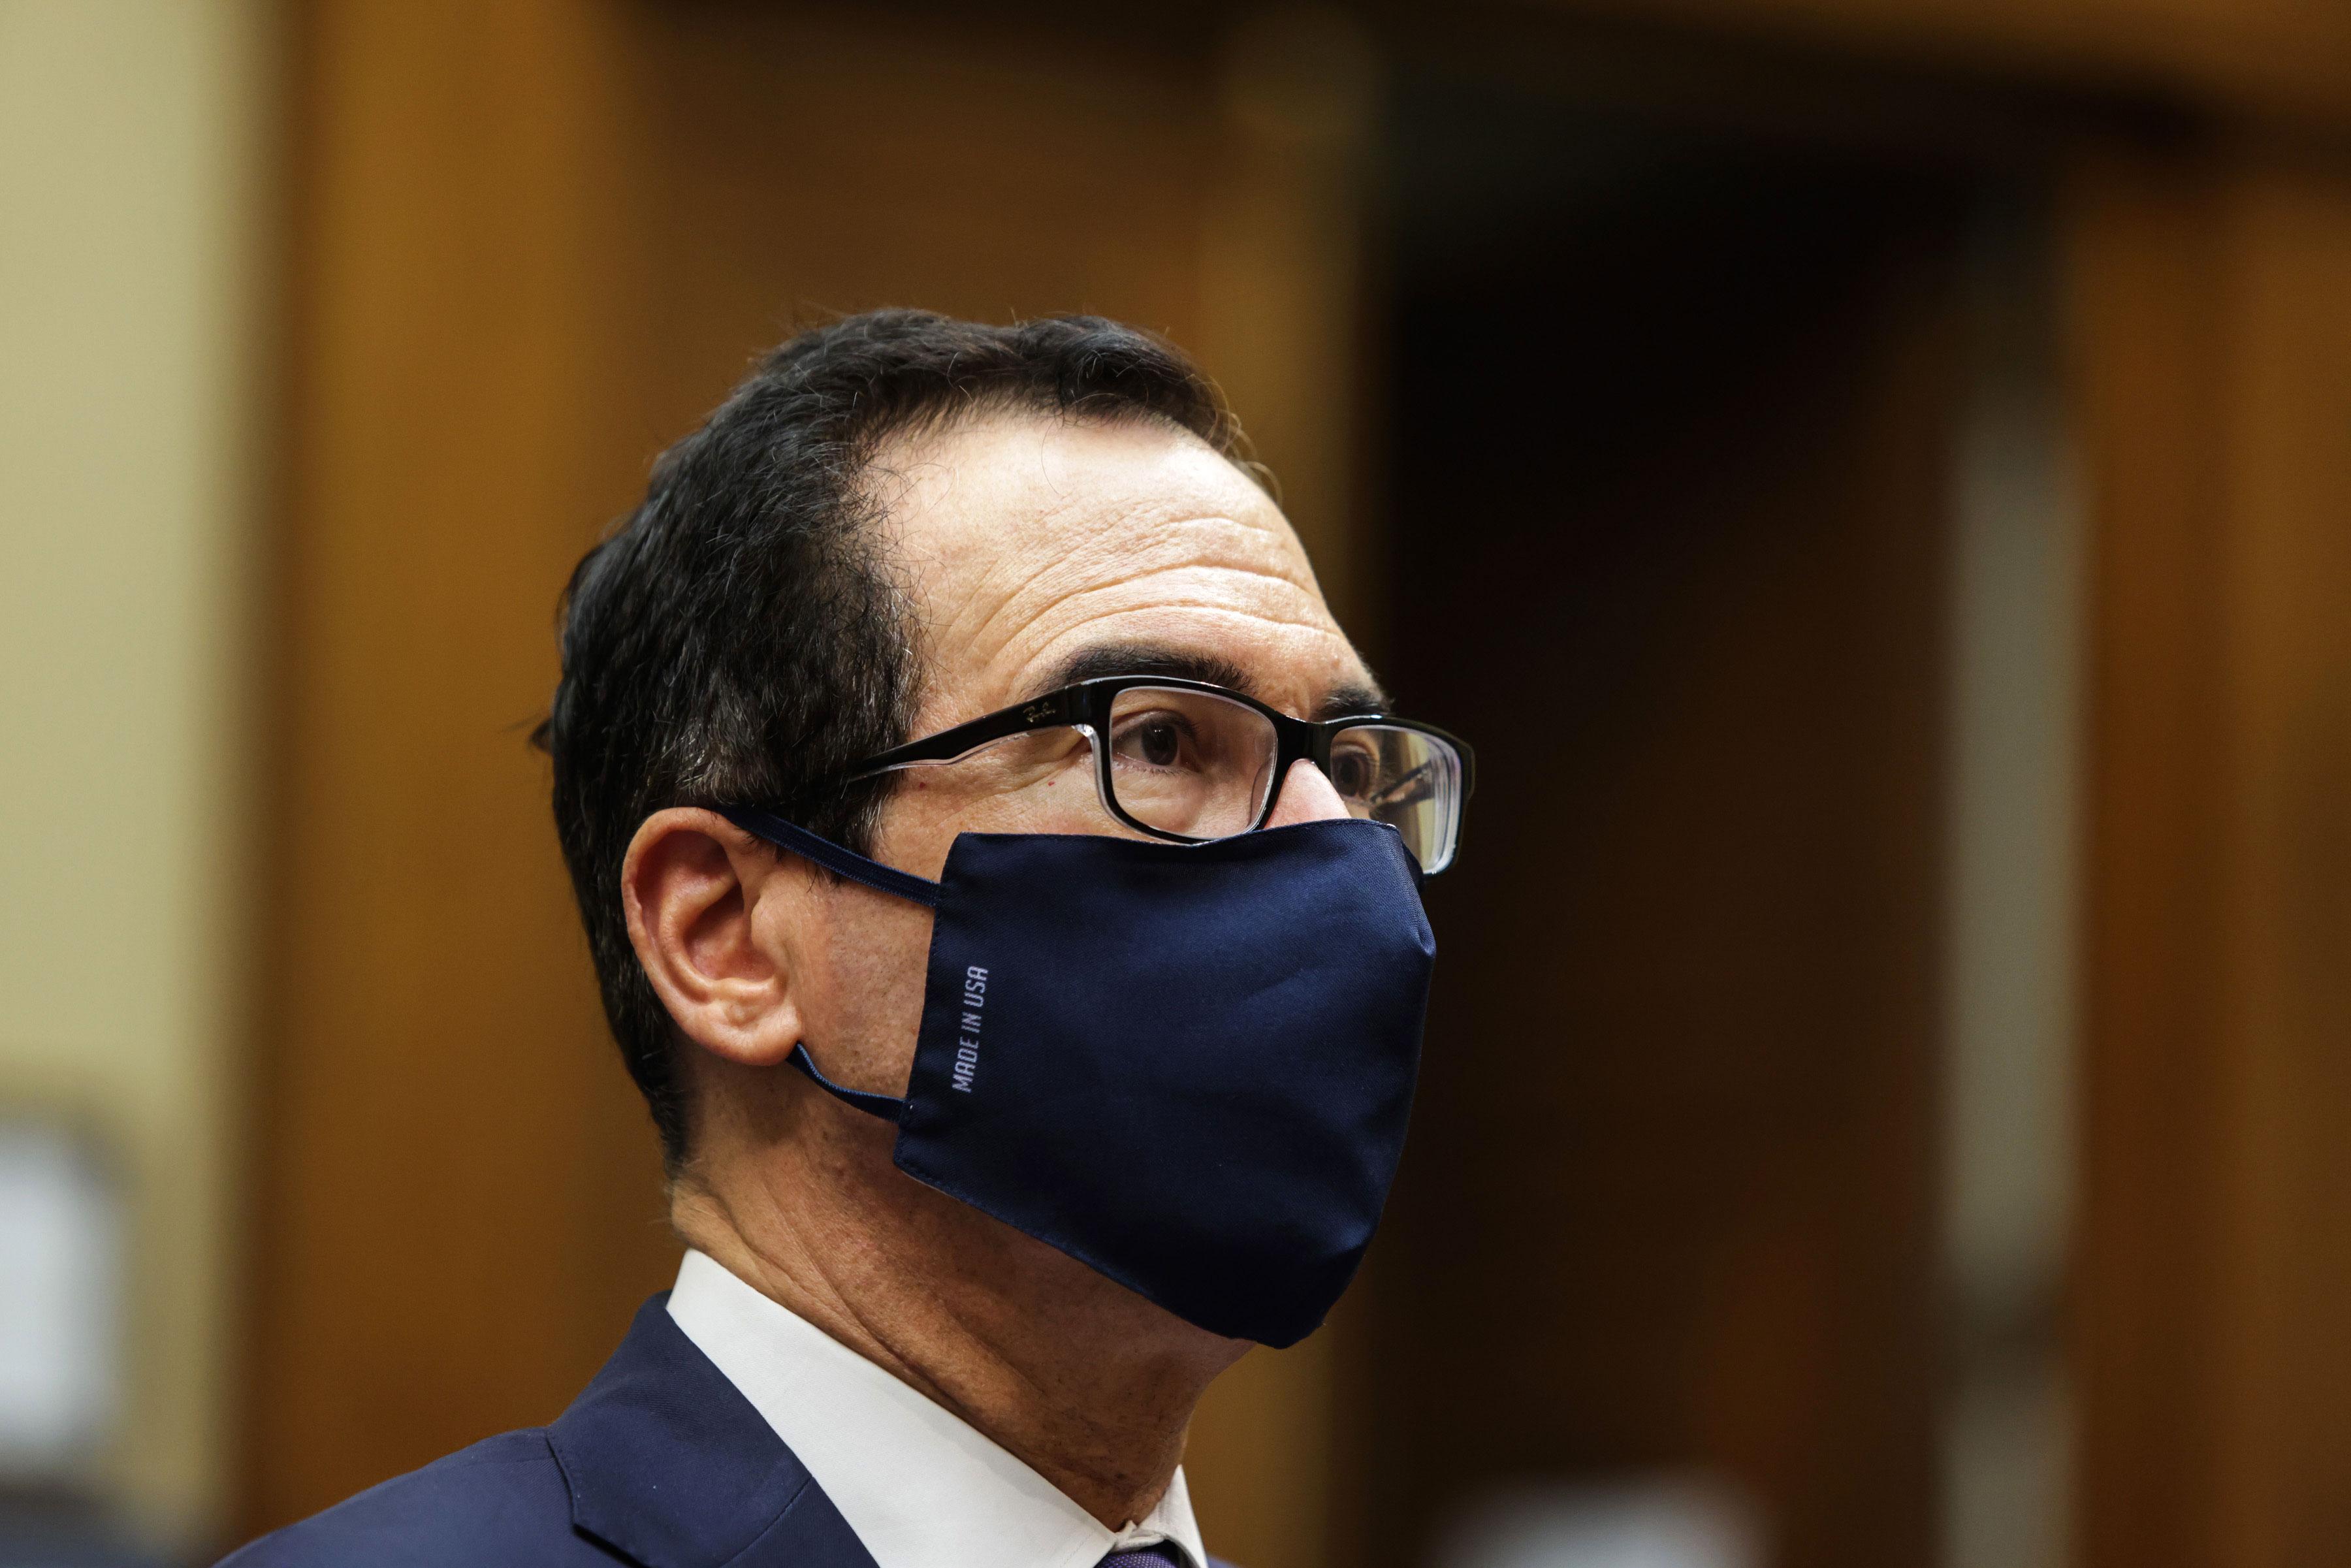 Treasury Secretary Steven Mnuchin attends a hearing in Washington, DC, on September 1.